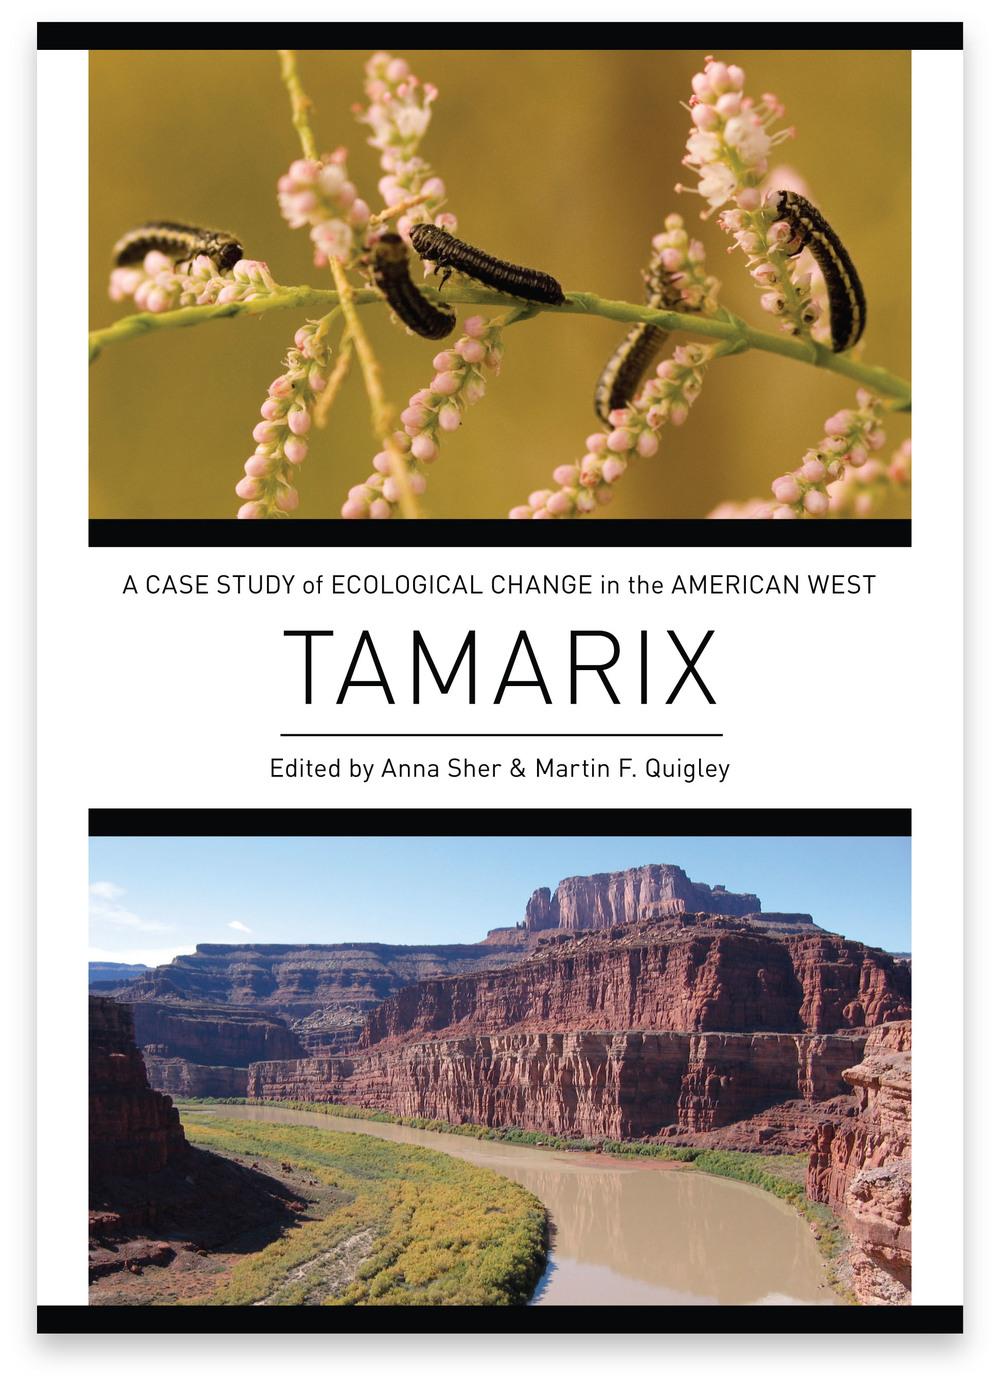 TamarixWebsite2.jpg